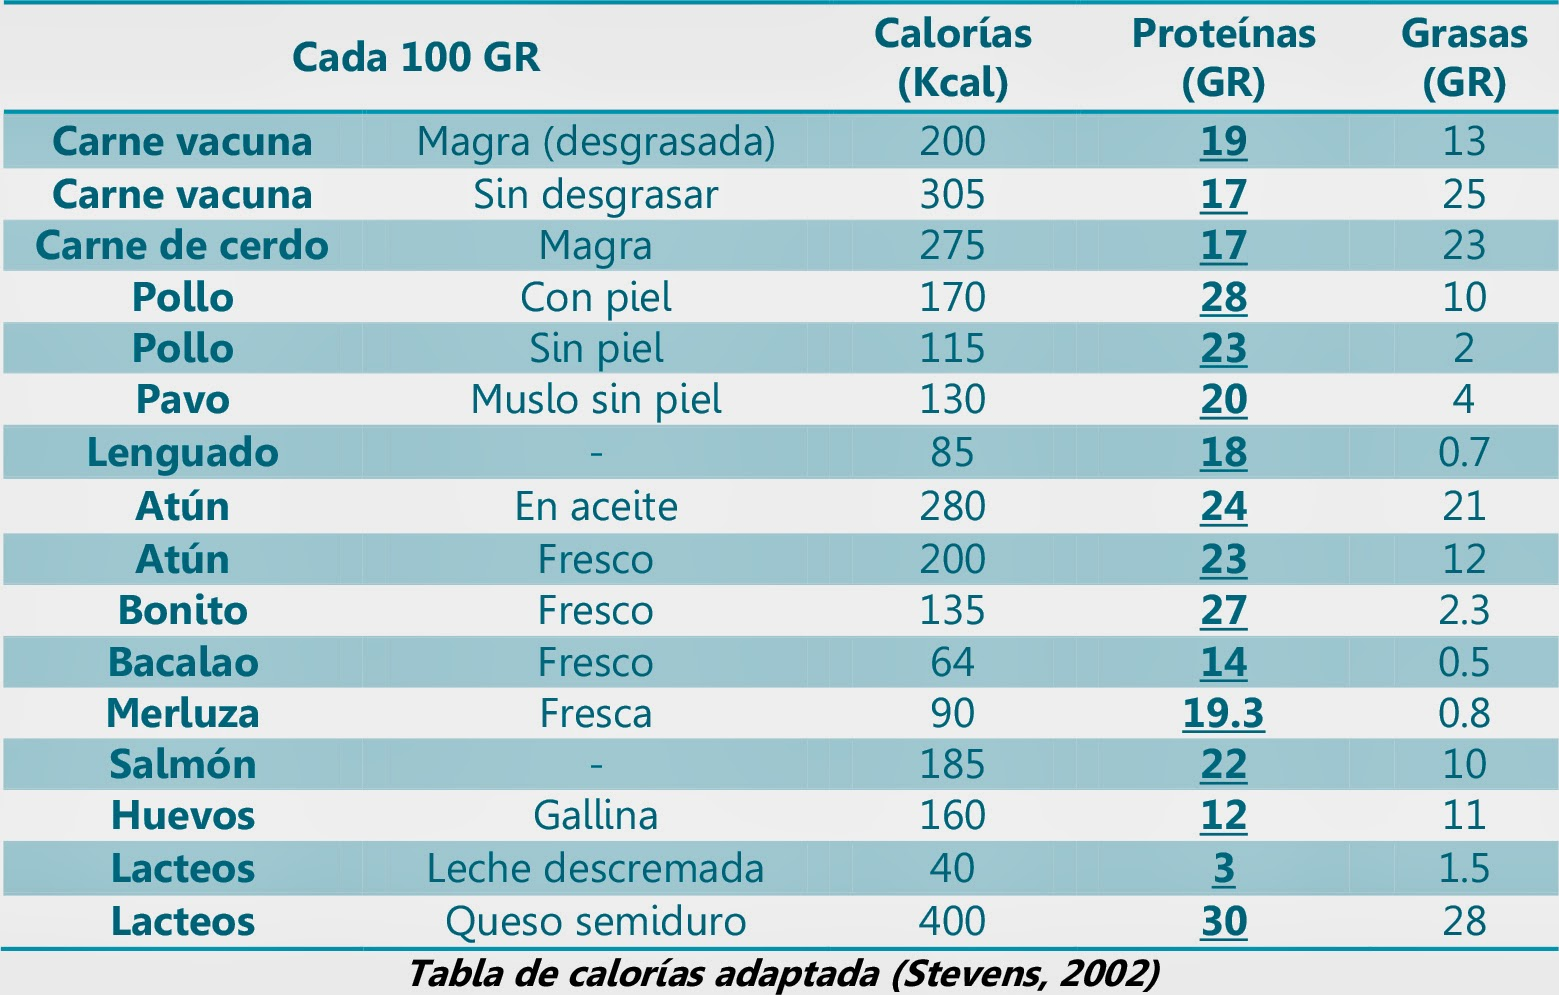 La dieta transformer transformer - Tabla de calorias de alimentos por cada 100 gramos ...